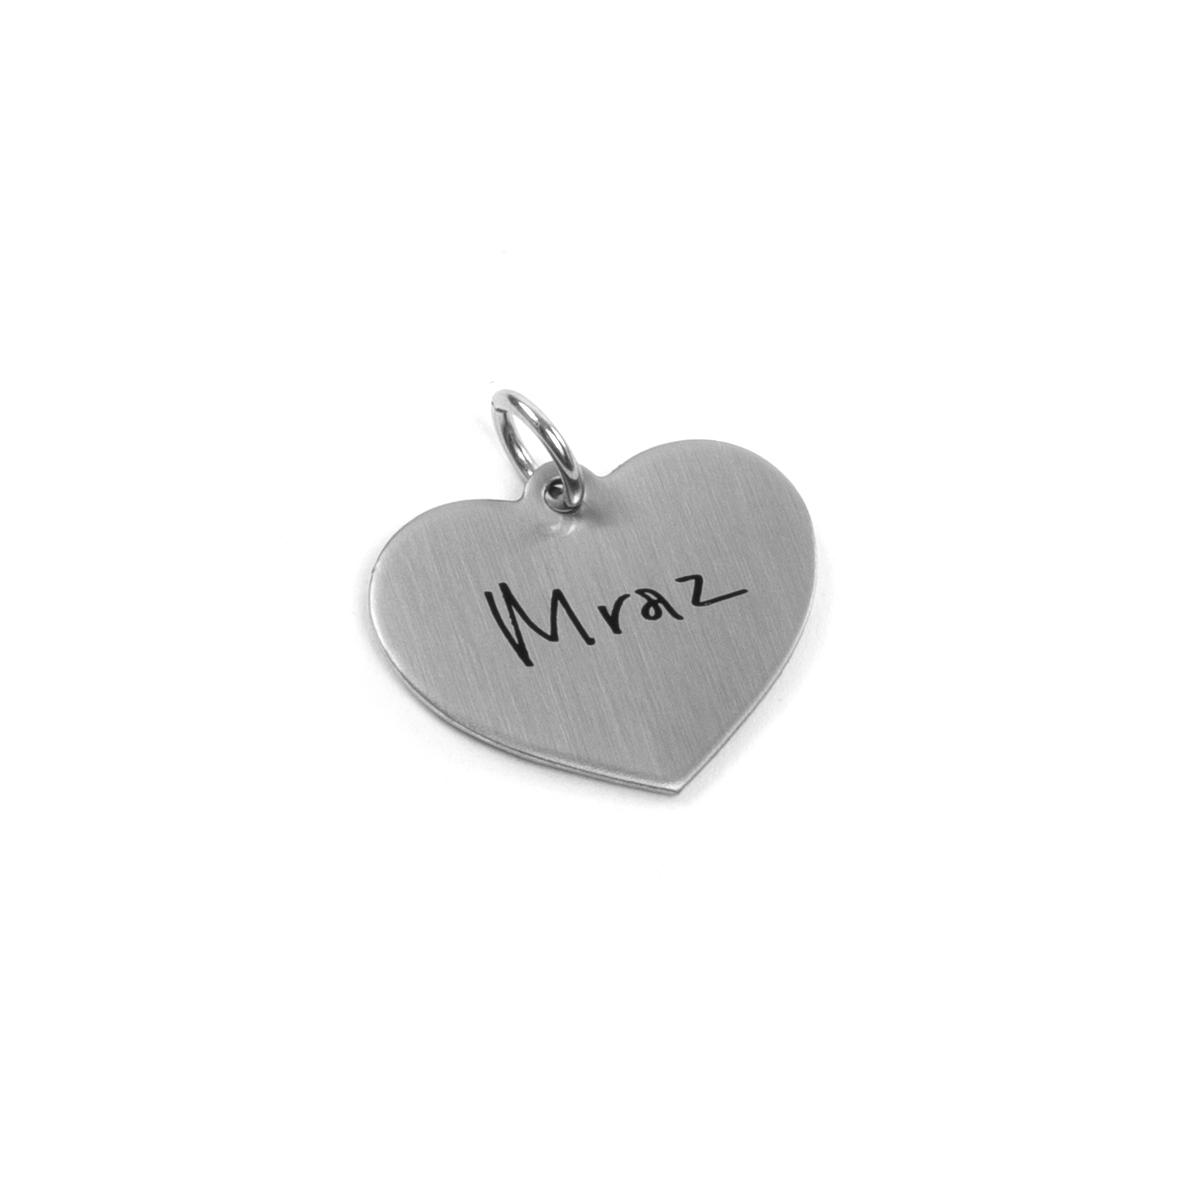 Jason Mraz Heart Charm